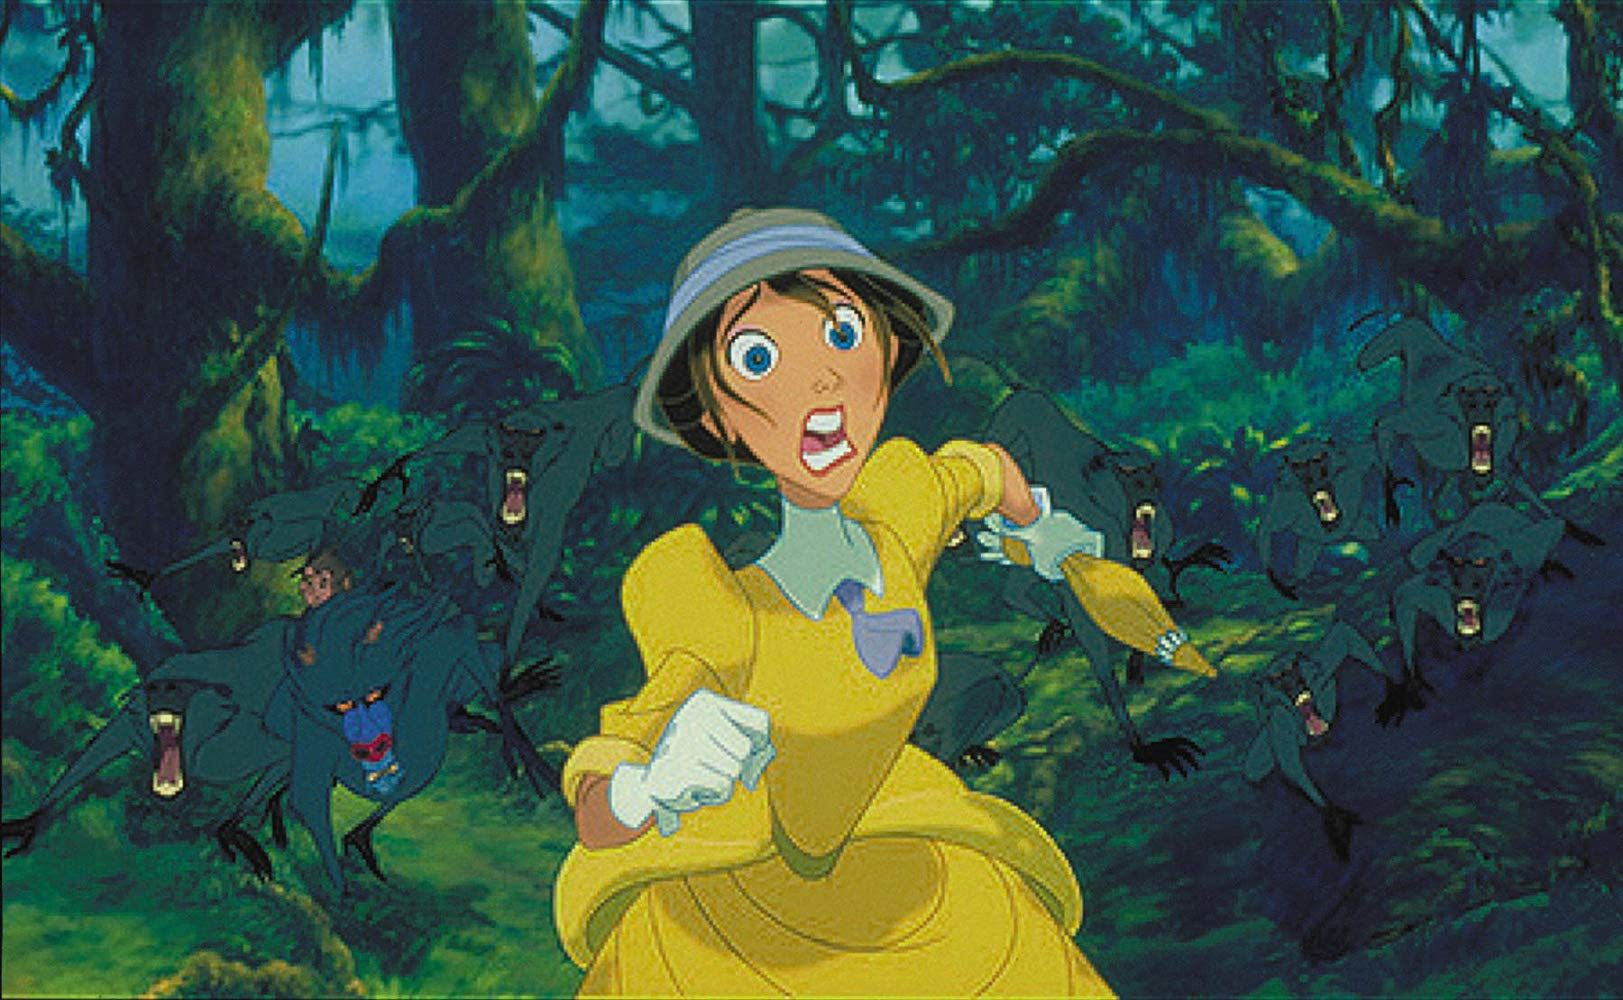 Minnie Driver in Tarzan (1999) (With images) Tarzan